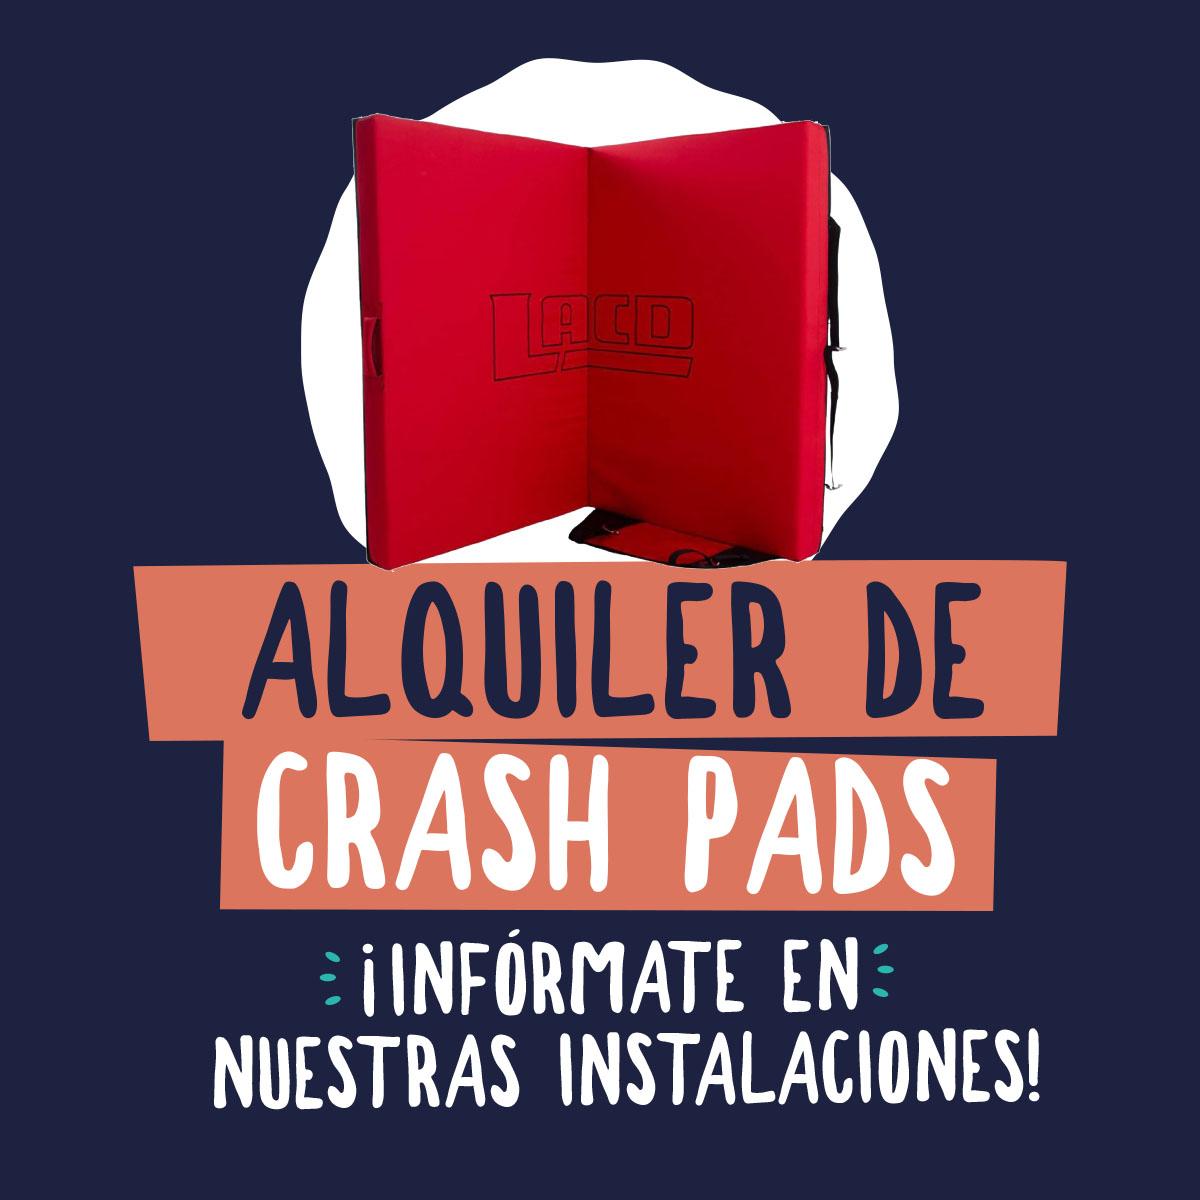 Alquiler de crash pad